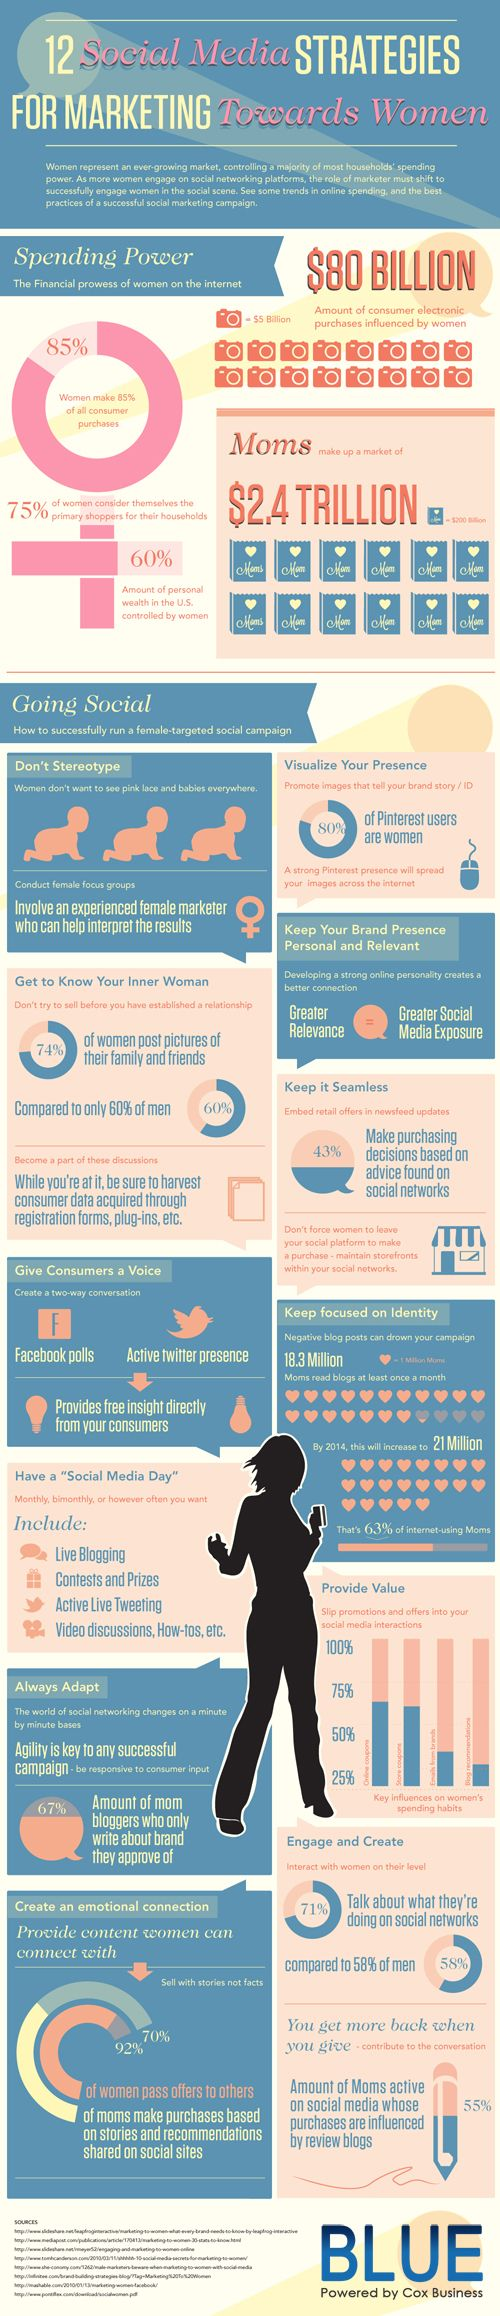 12 Social Media Strategies for Marketing Towards Women. #biz #socialmedia #infographic